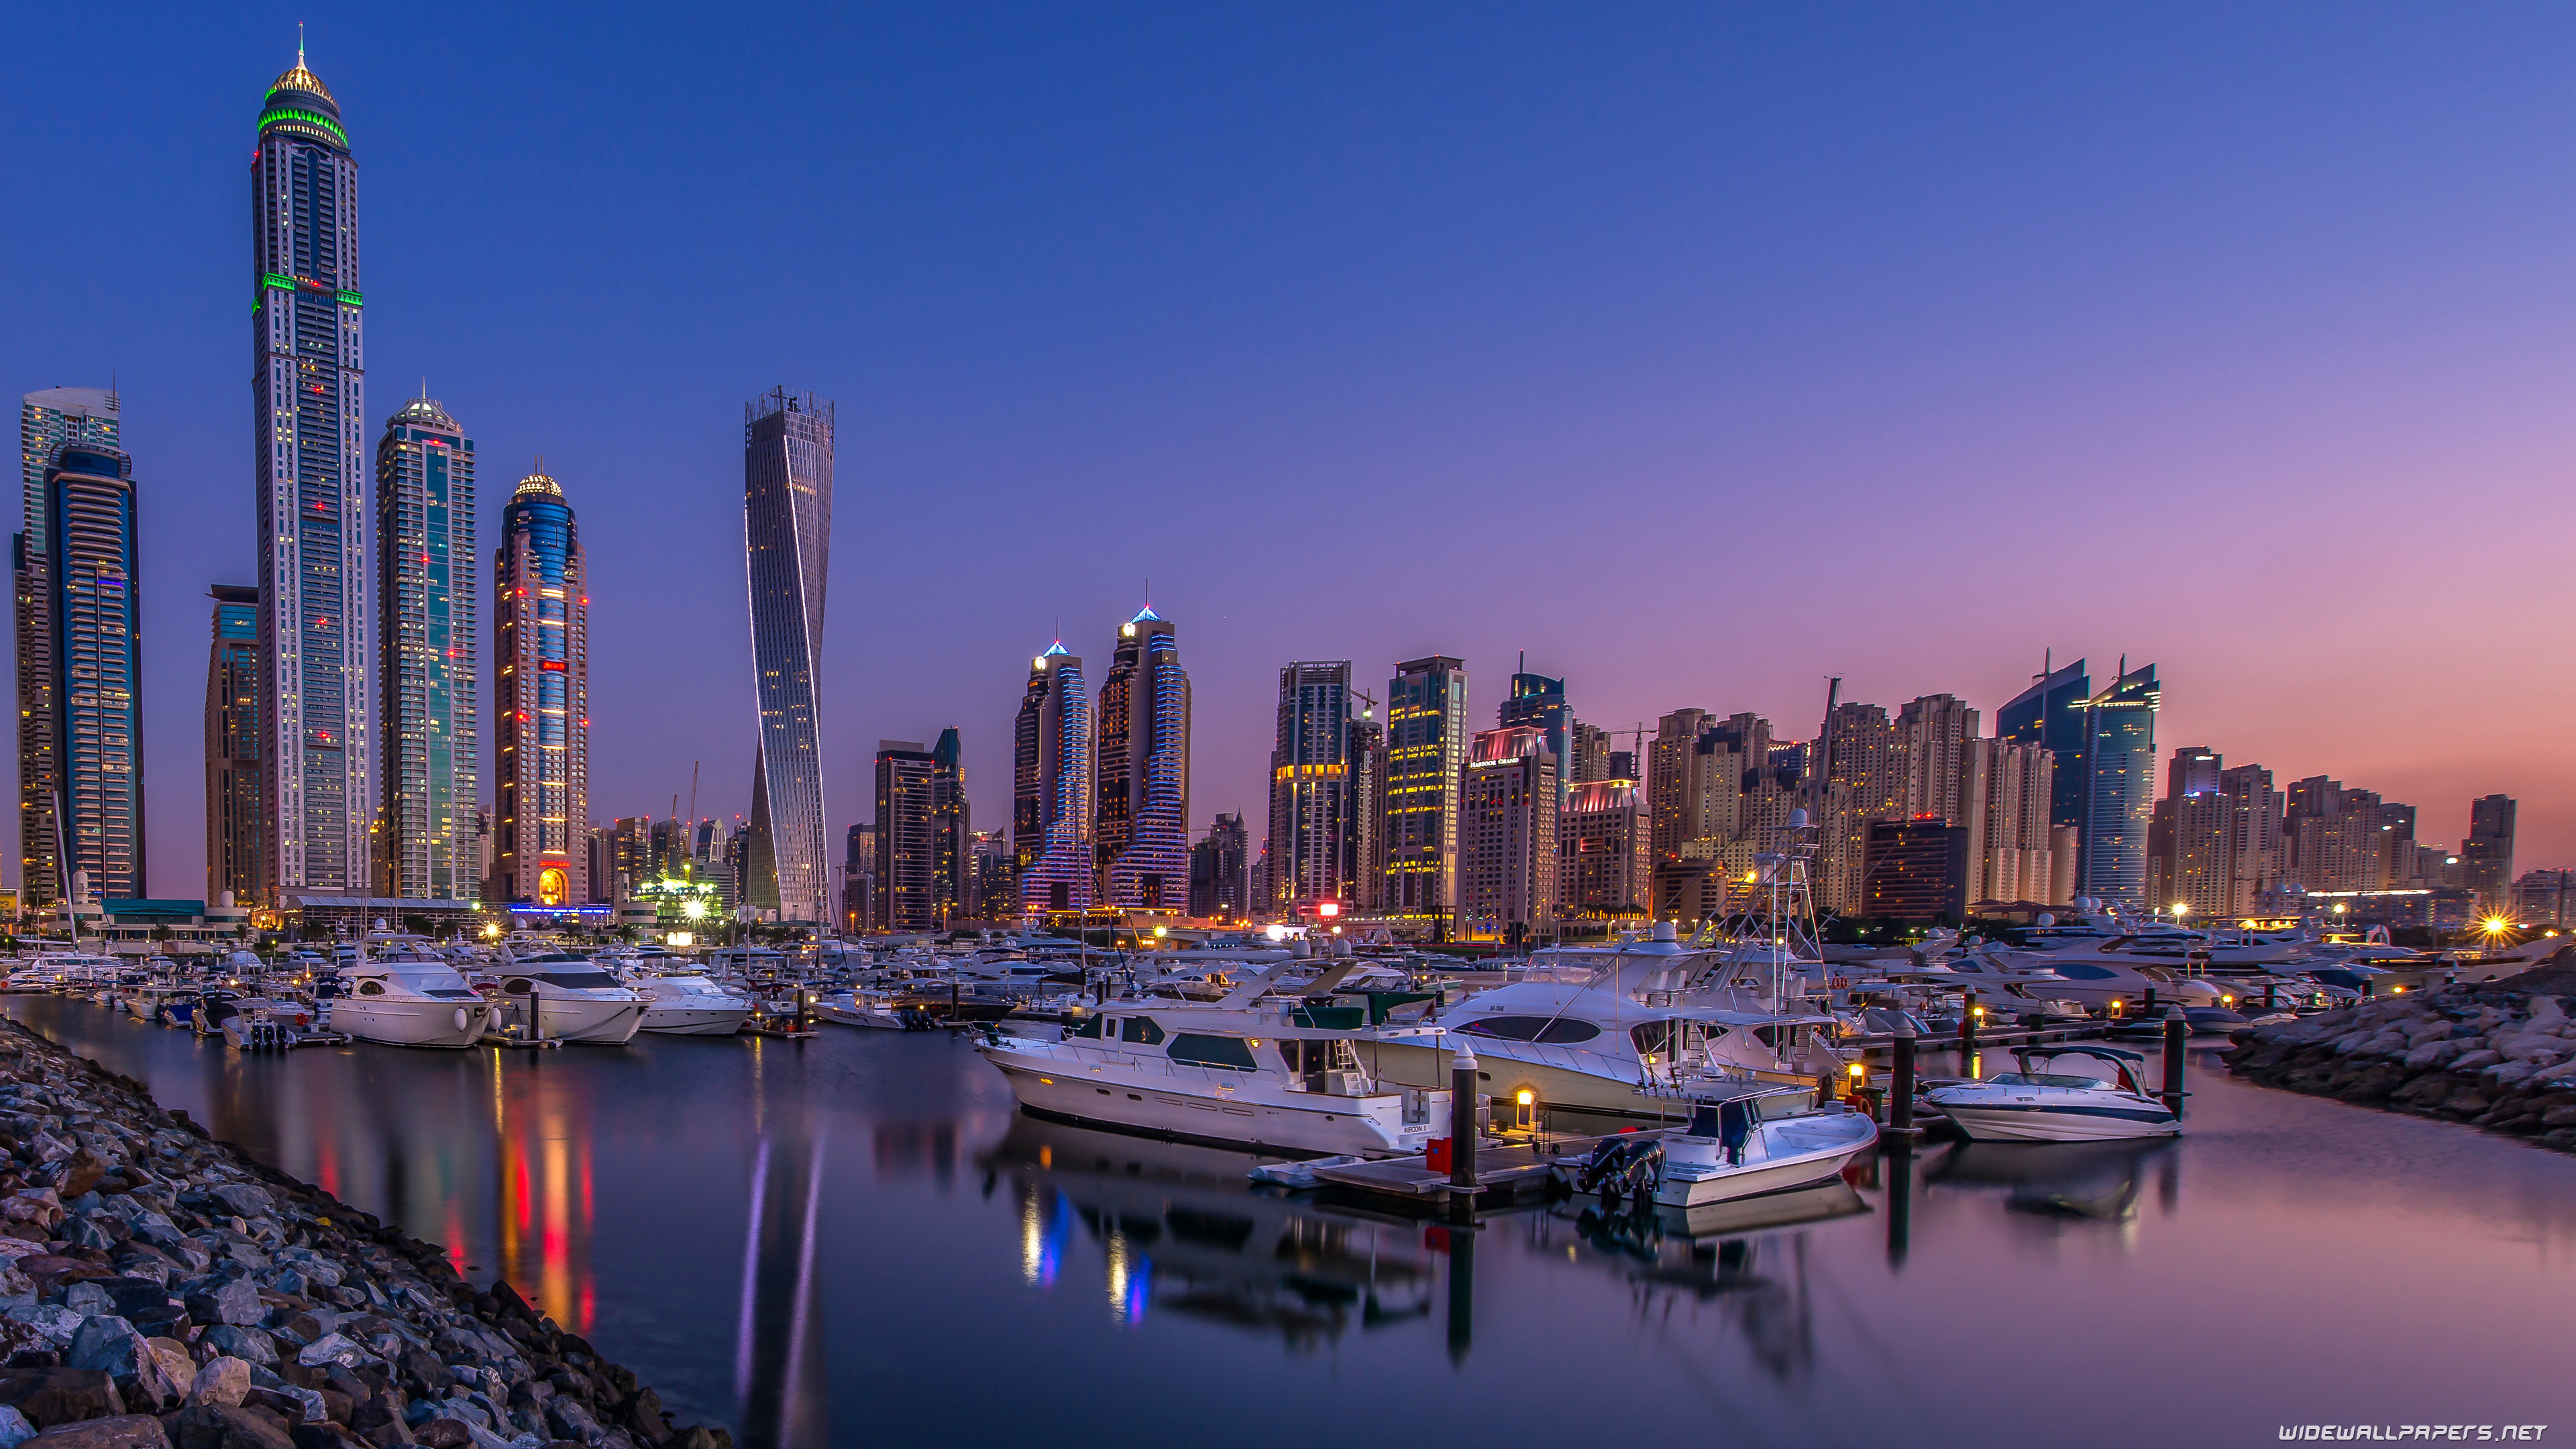 Dubai Desktop Wallpapers 4k Ultra Hd 2 Dubai Skyline